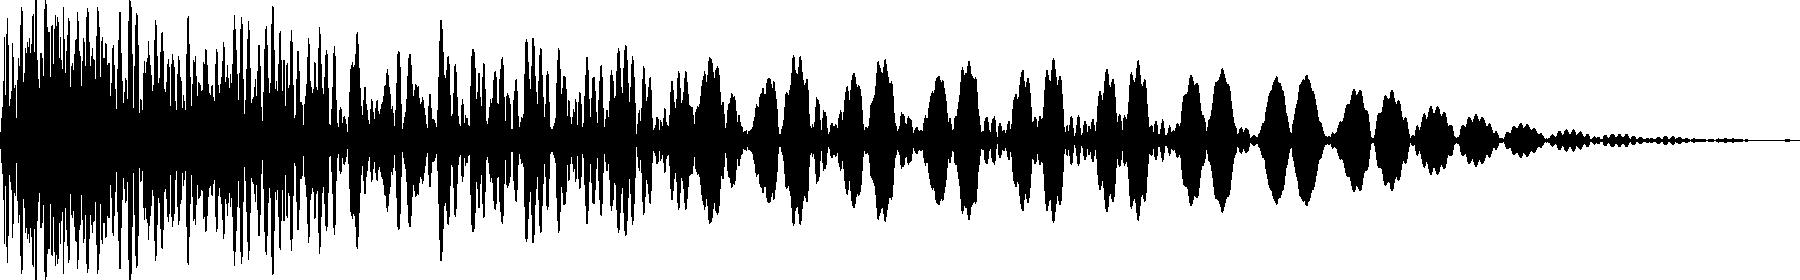 vedh synth cut 040 f